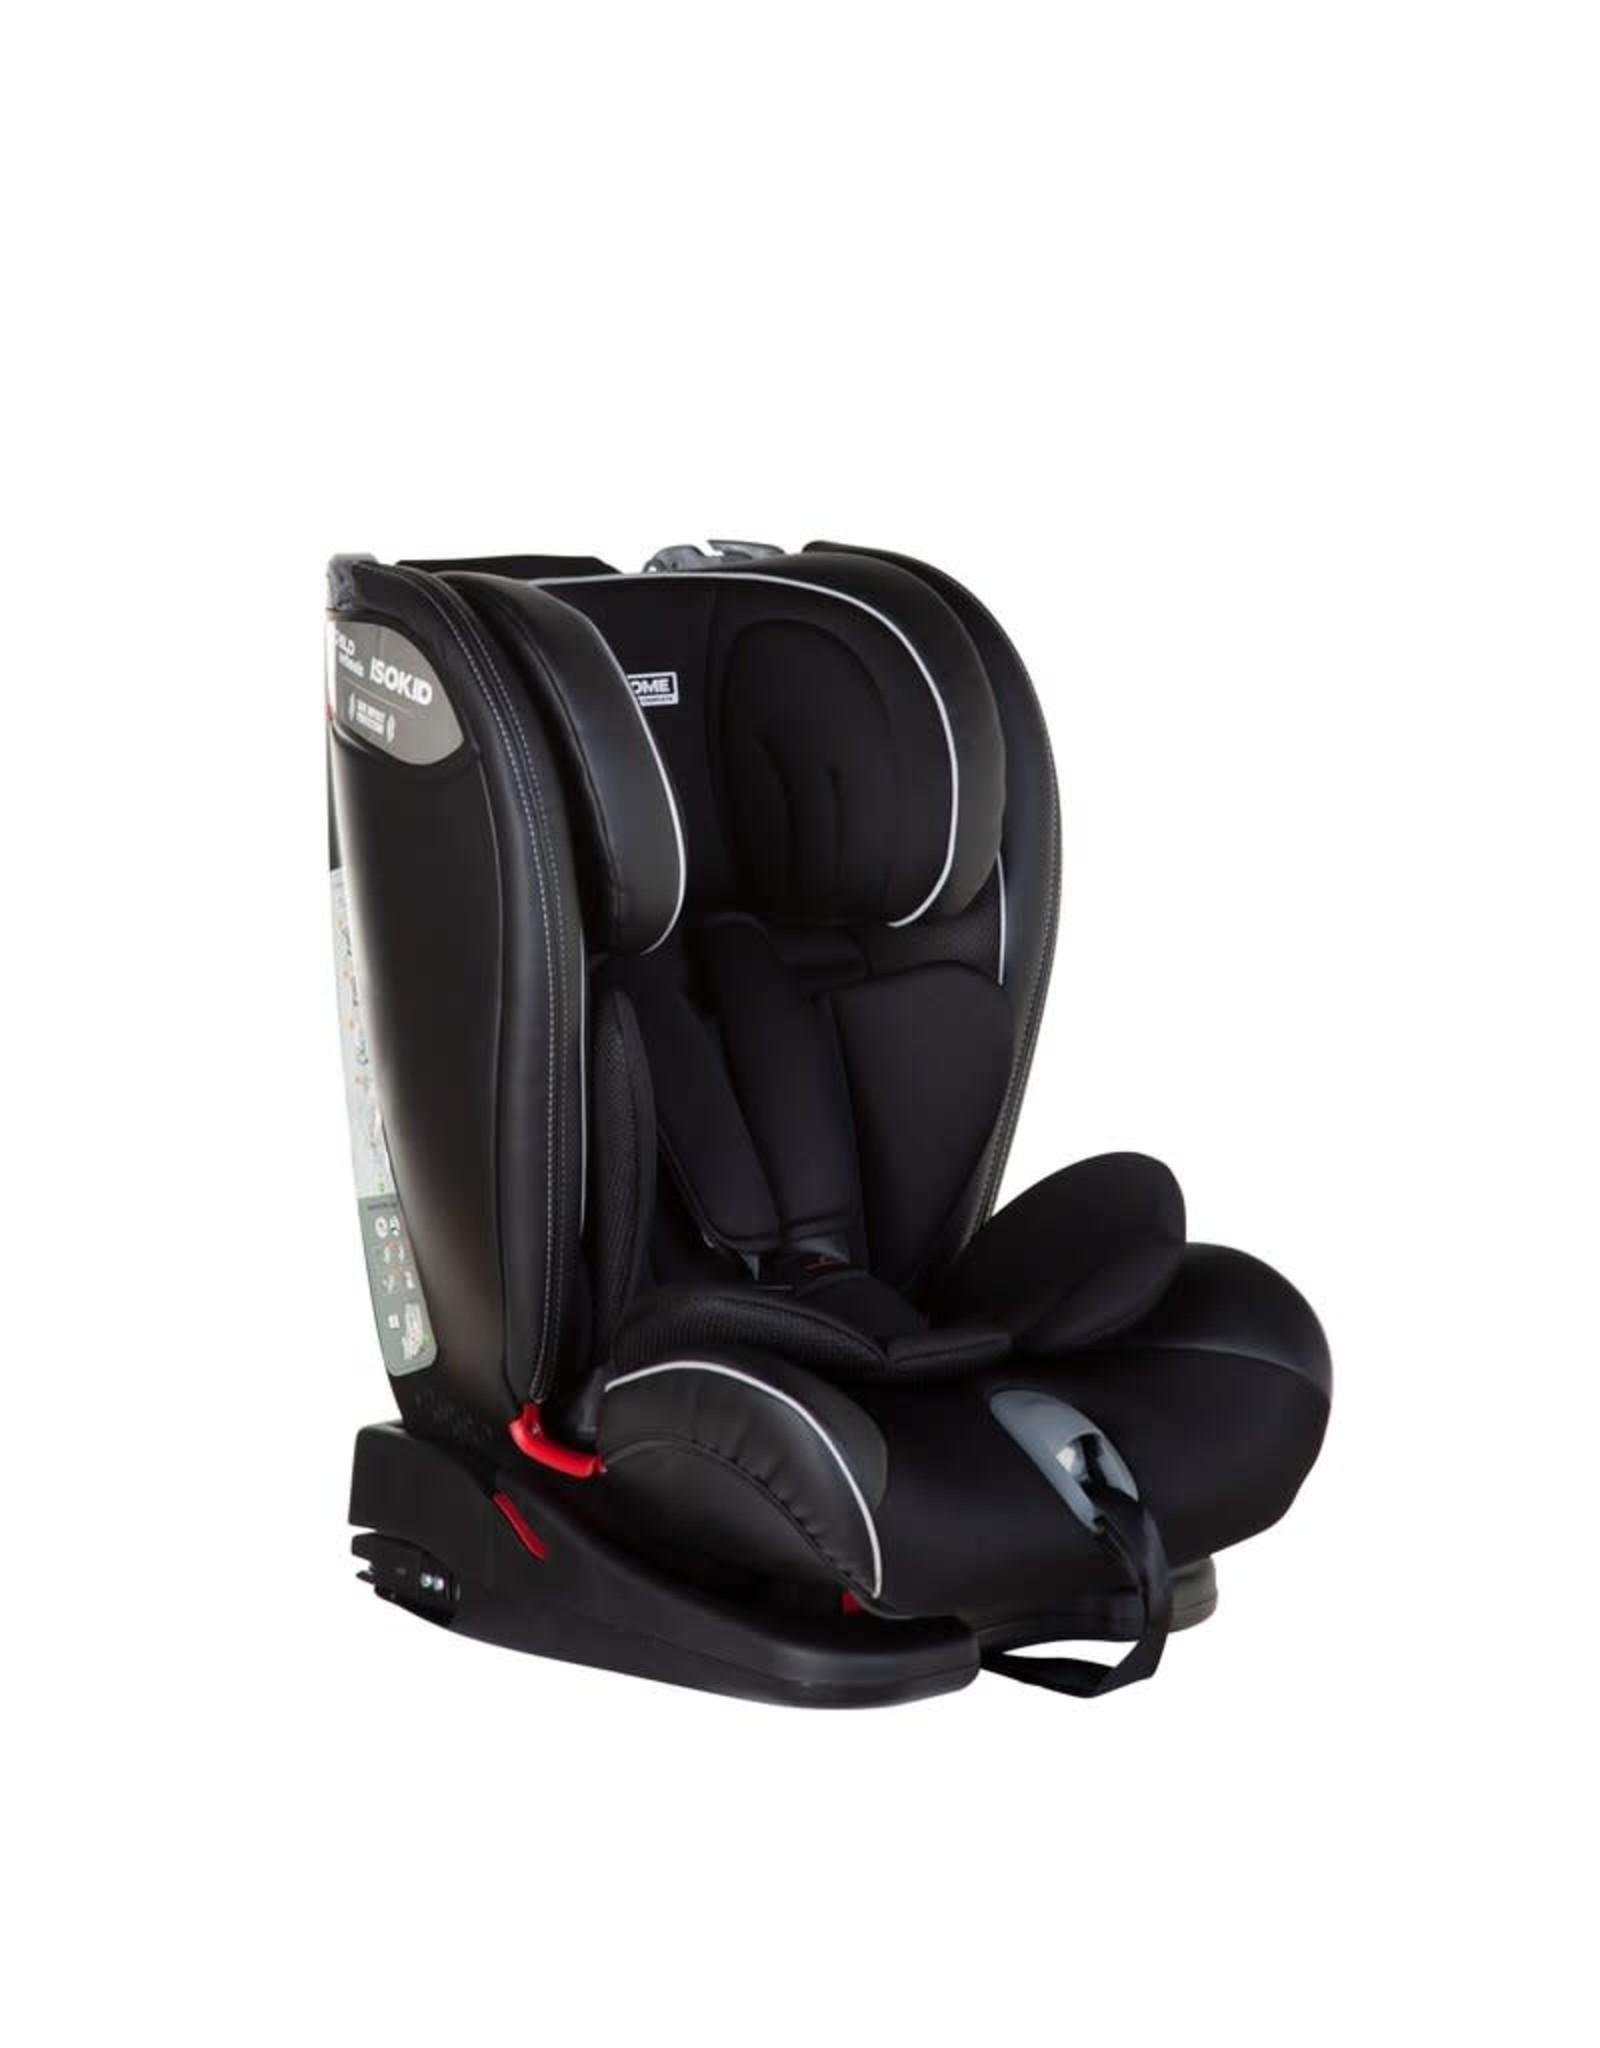 Childhome Childhome Isokid Autostoel - Groep 1+2+3 - Isofix - Zwart